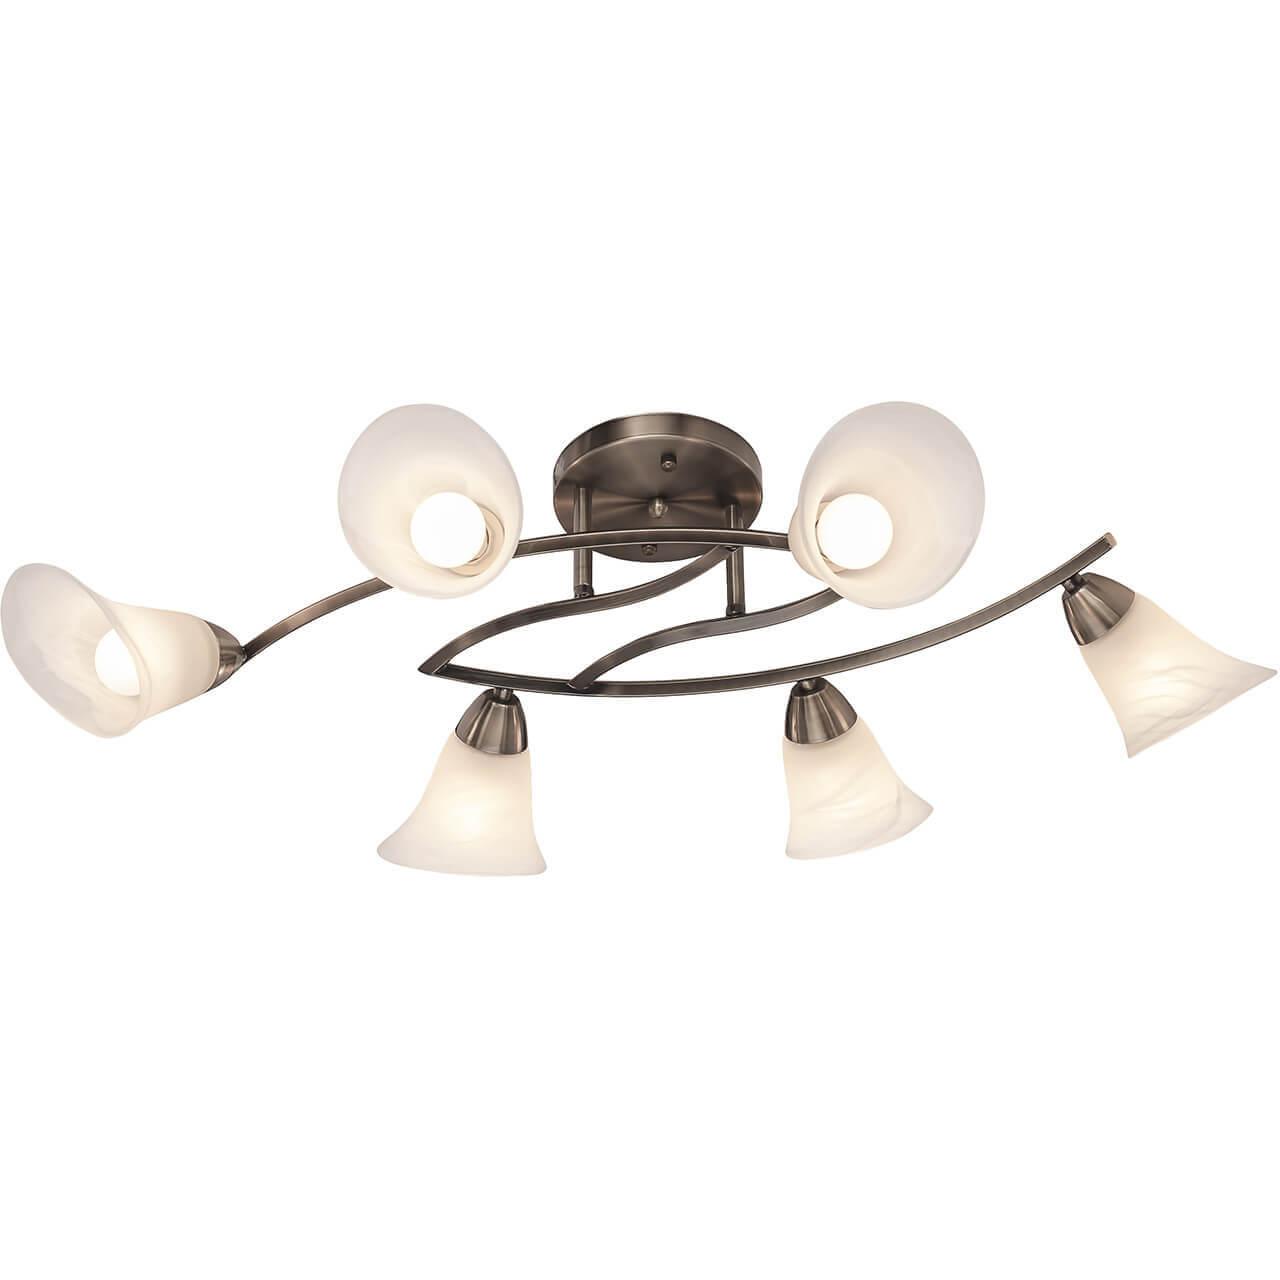 Люстра Silver Light 220.53.6 Tvia